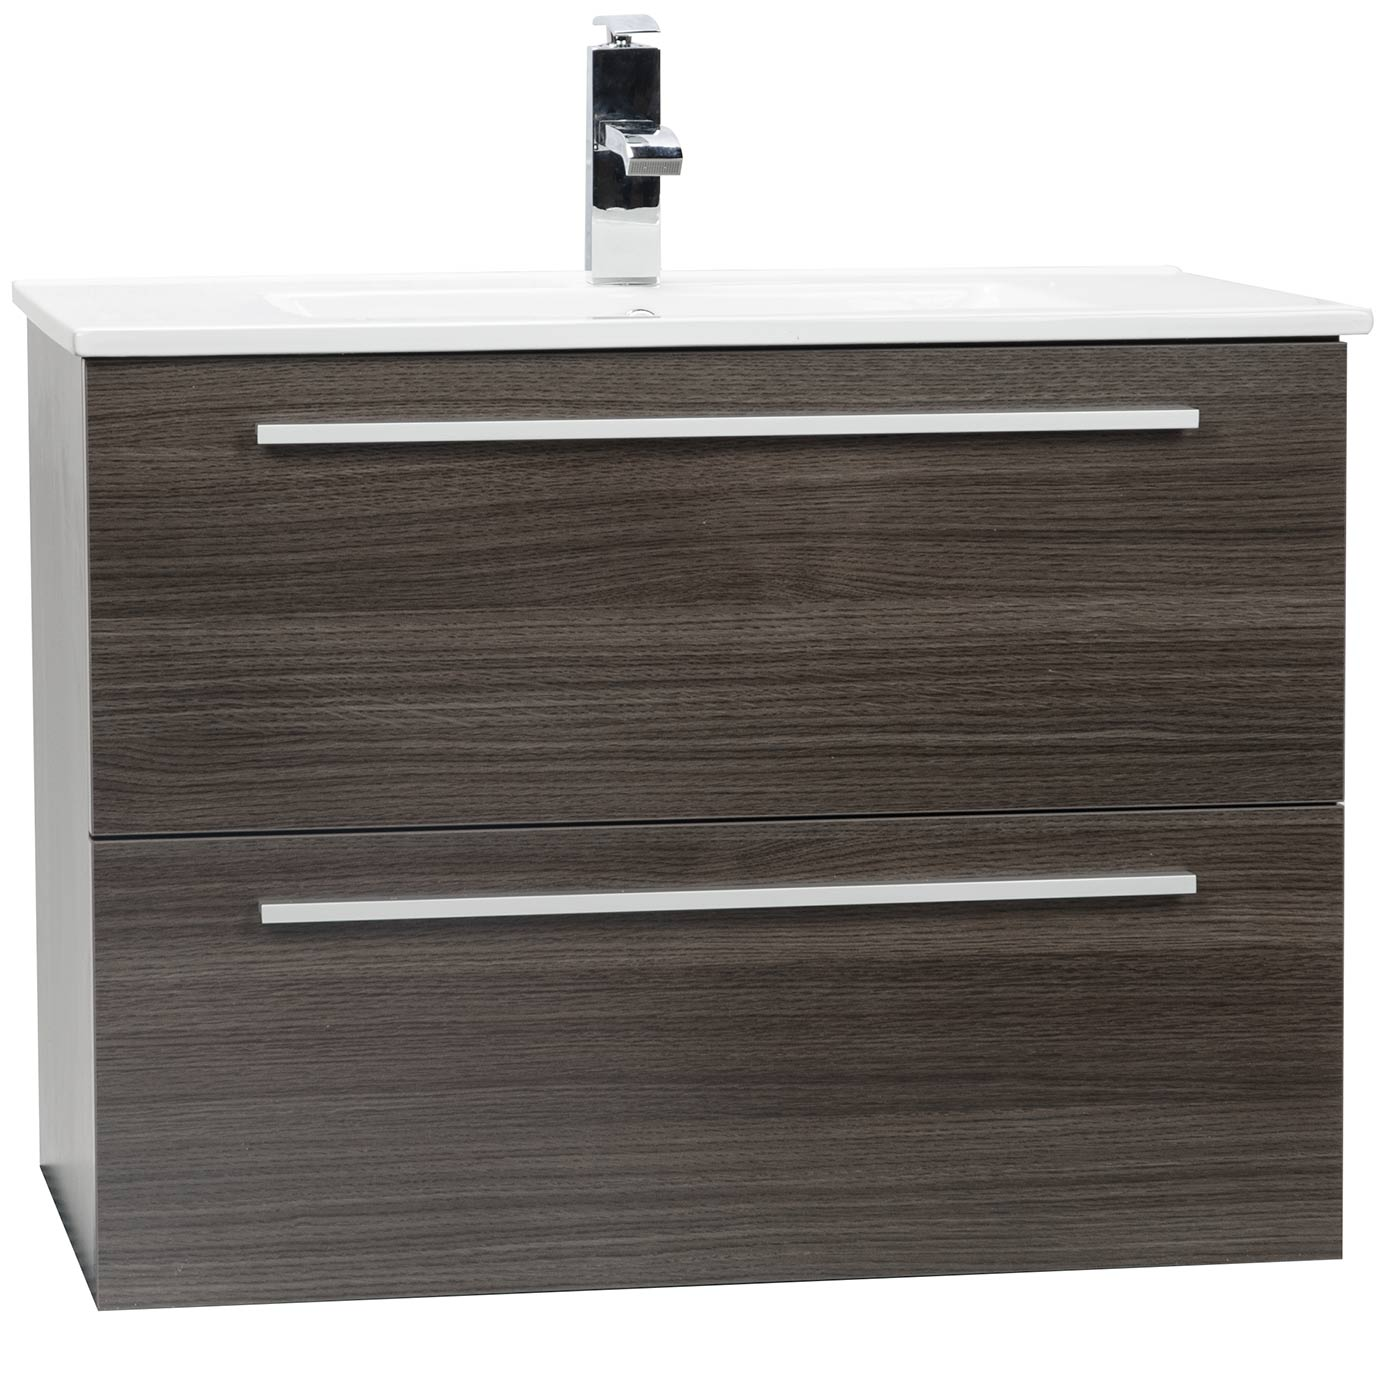 30 Bathroom Cabinet Bathroom Vanities Bathroom Vanity Furniture Cabinets